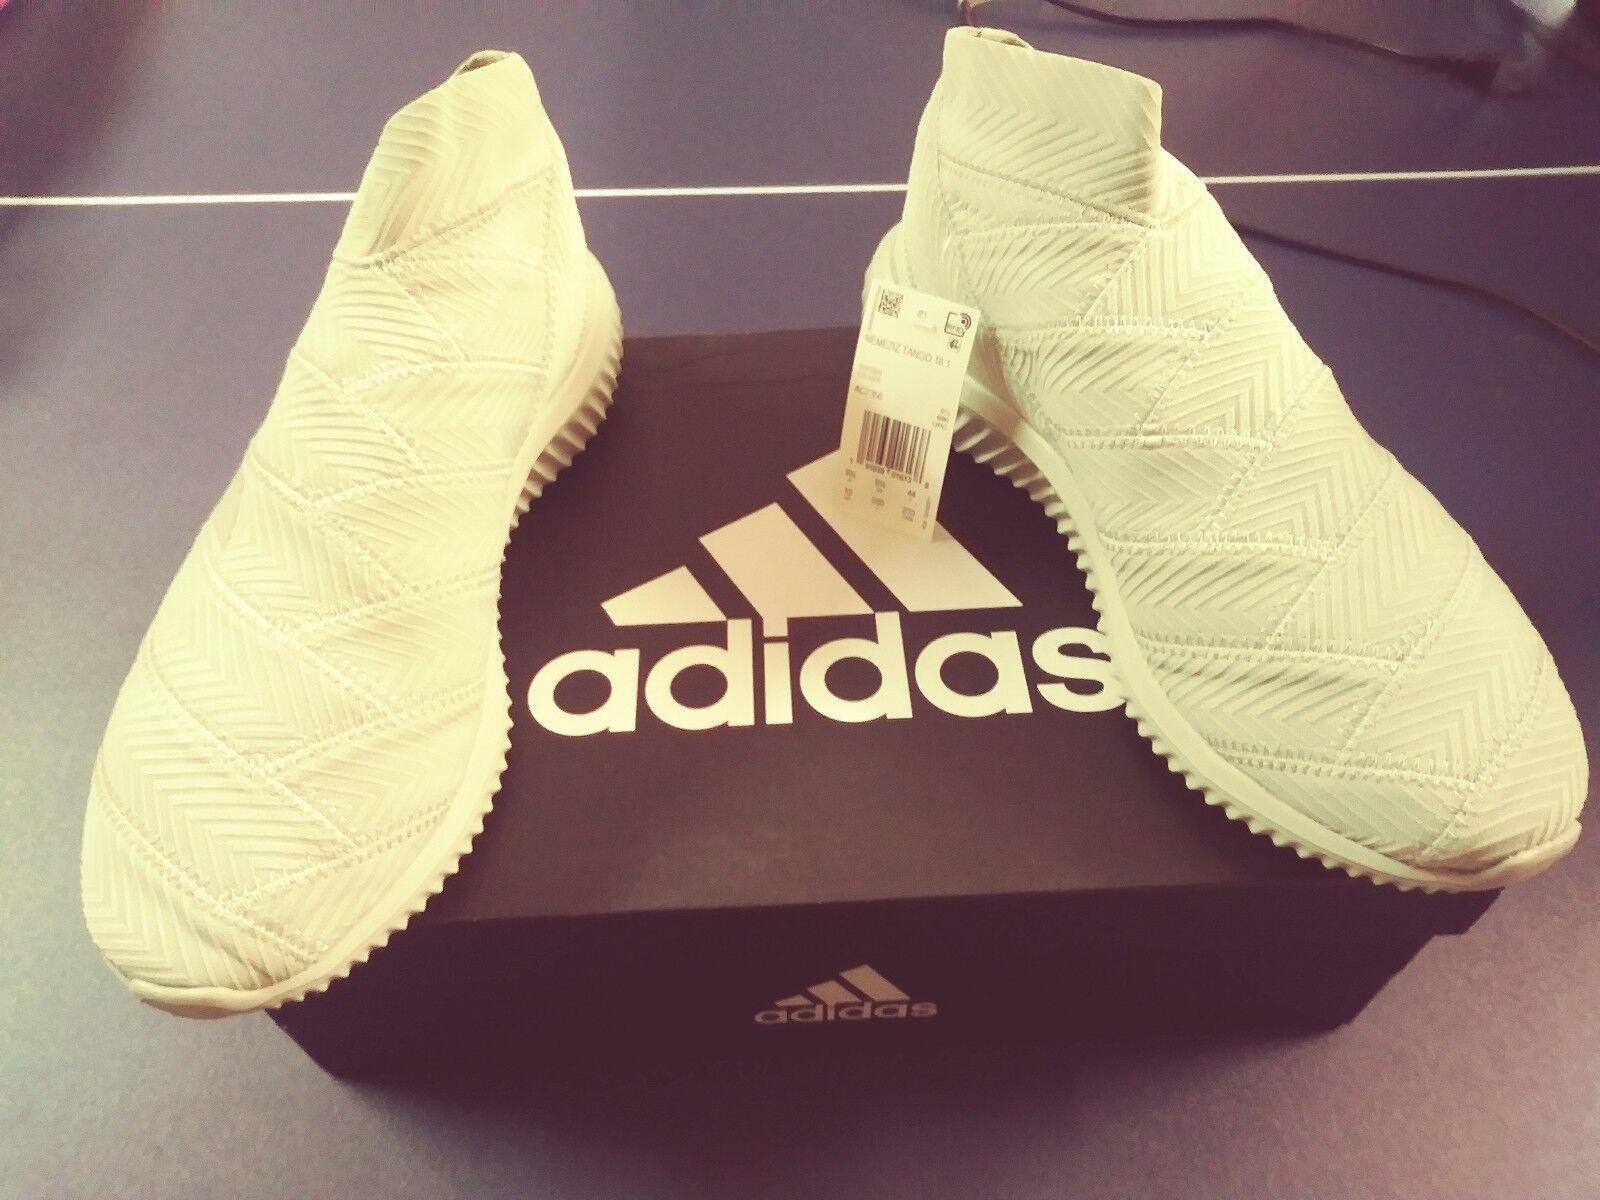 Adidas Nemeziz Tango 18.1 Grey Mens Cross Training Soccer shoes men's size 10